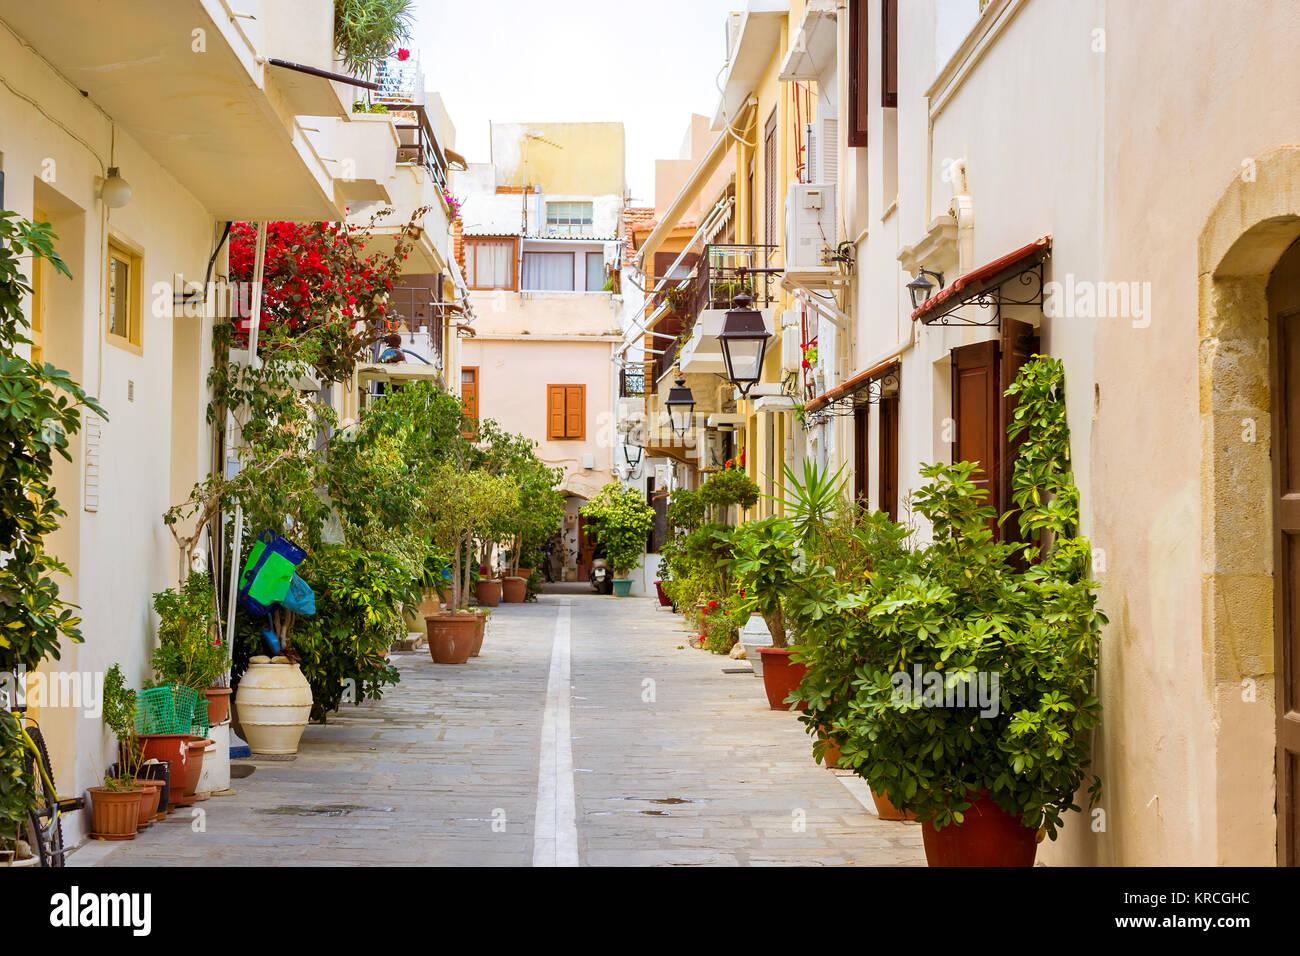 Rethymno Greece Crete. Walk around the old resort town Rethymno in Greece. Architecture and Mediterranean attractions Stock Photo